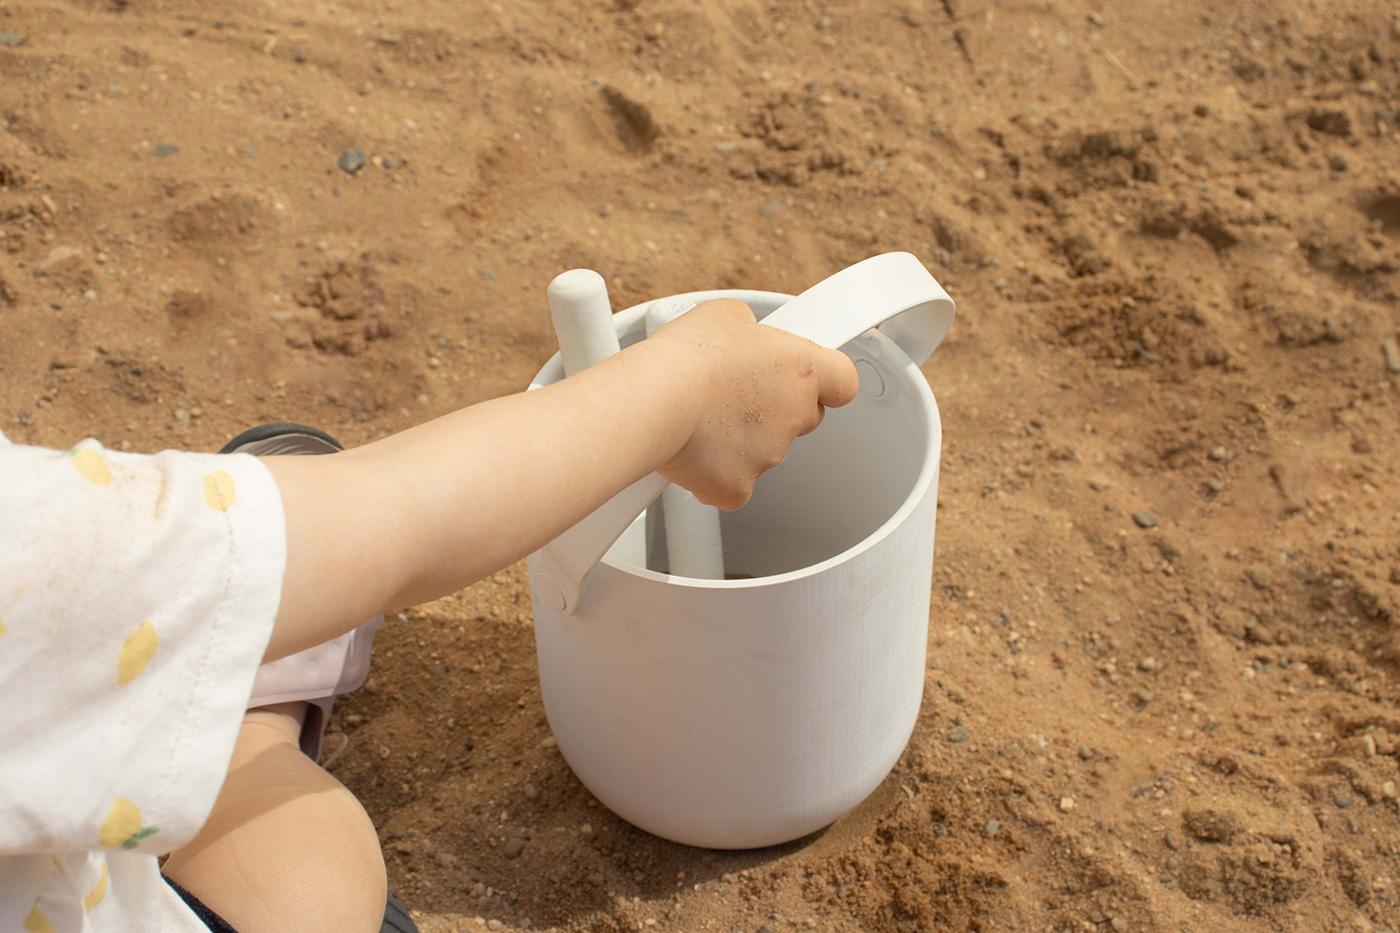 bucket house kids sand spade toys